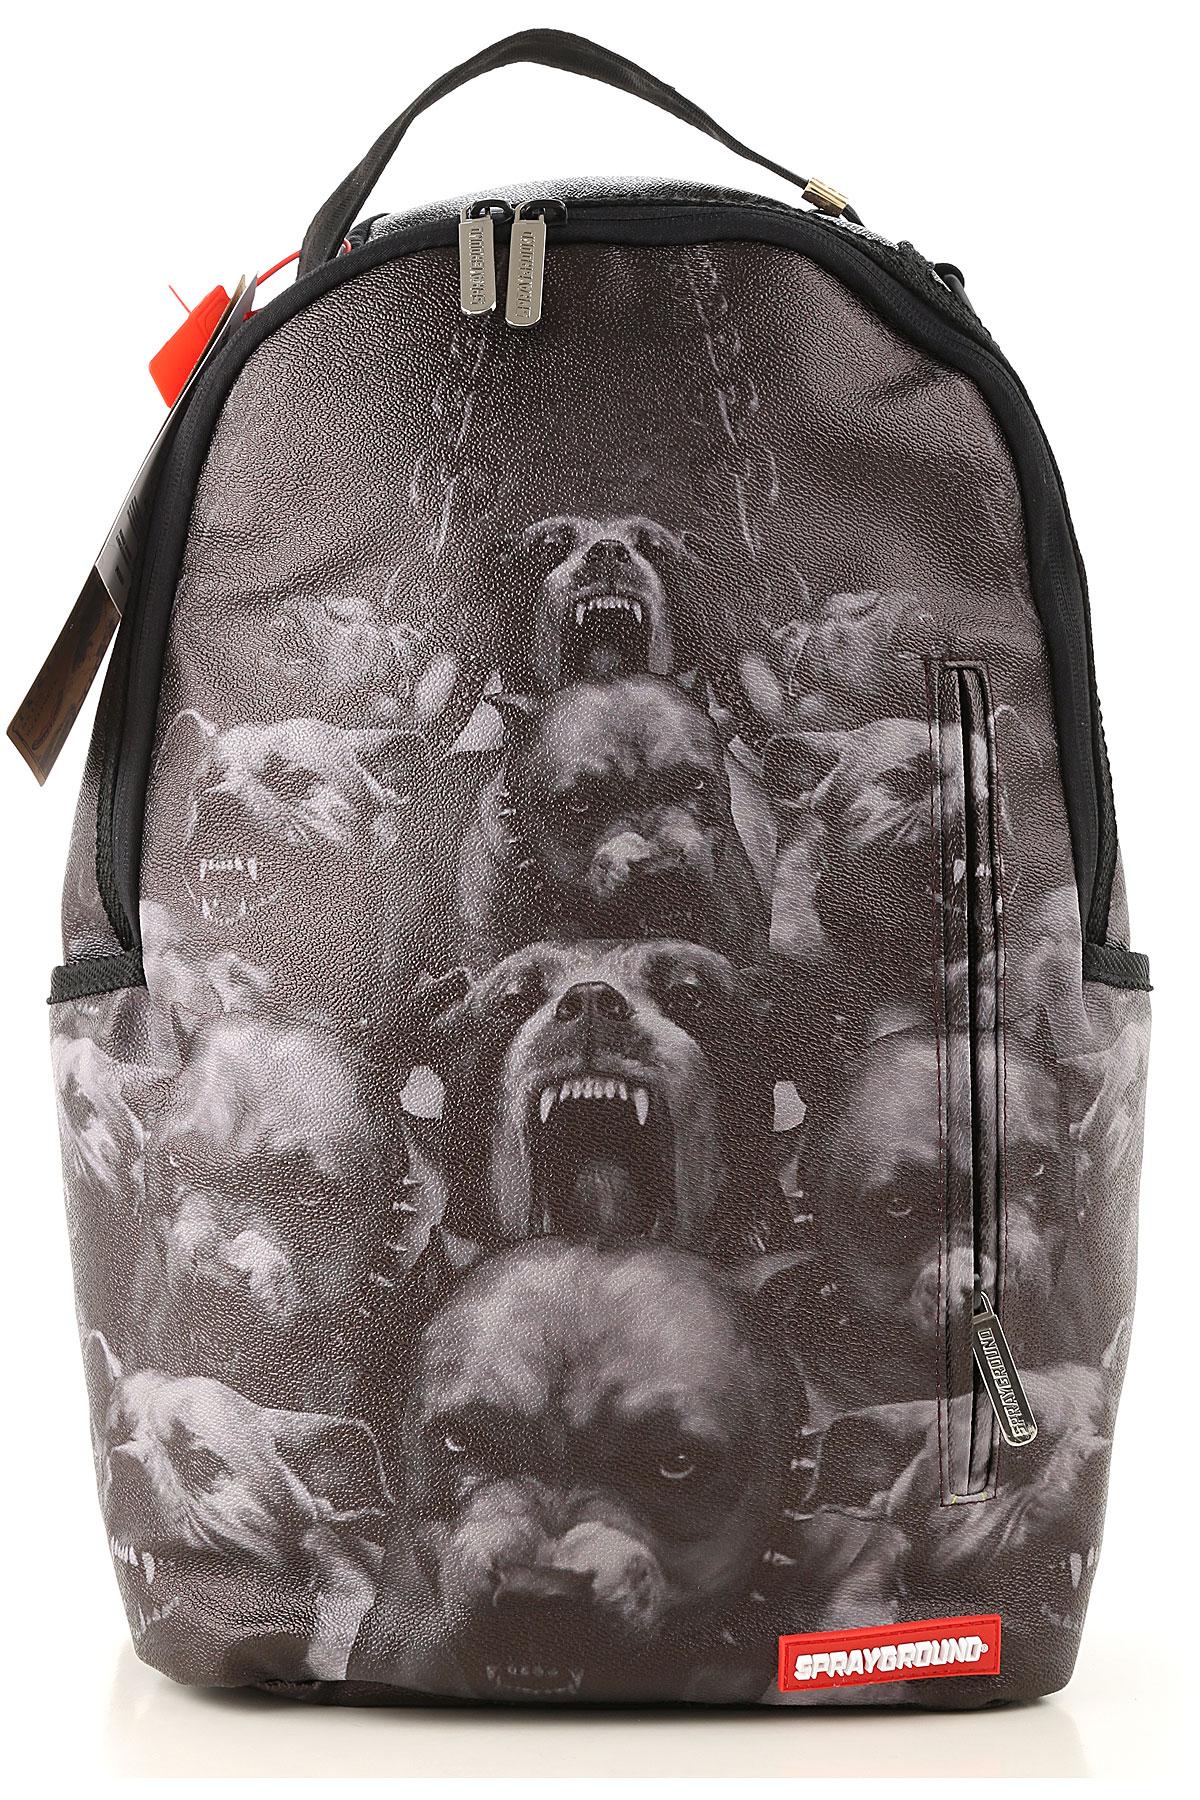 Sprayground Backpack for Men On Sale, Black, polyestere, 2019